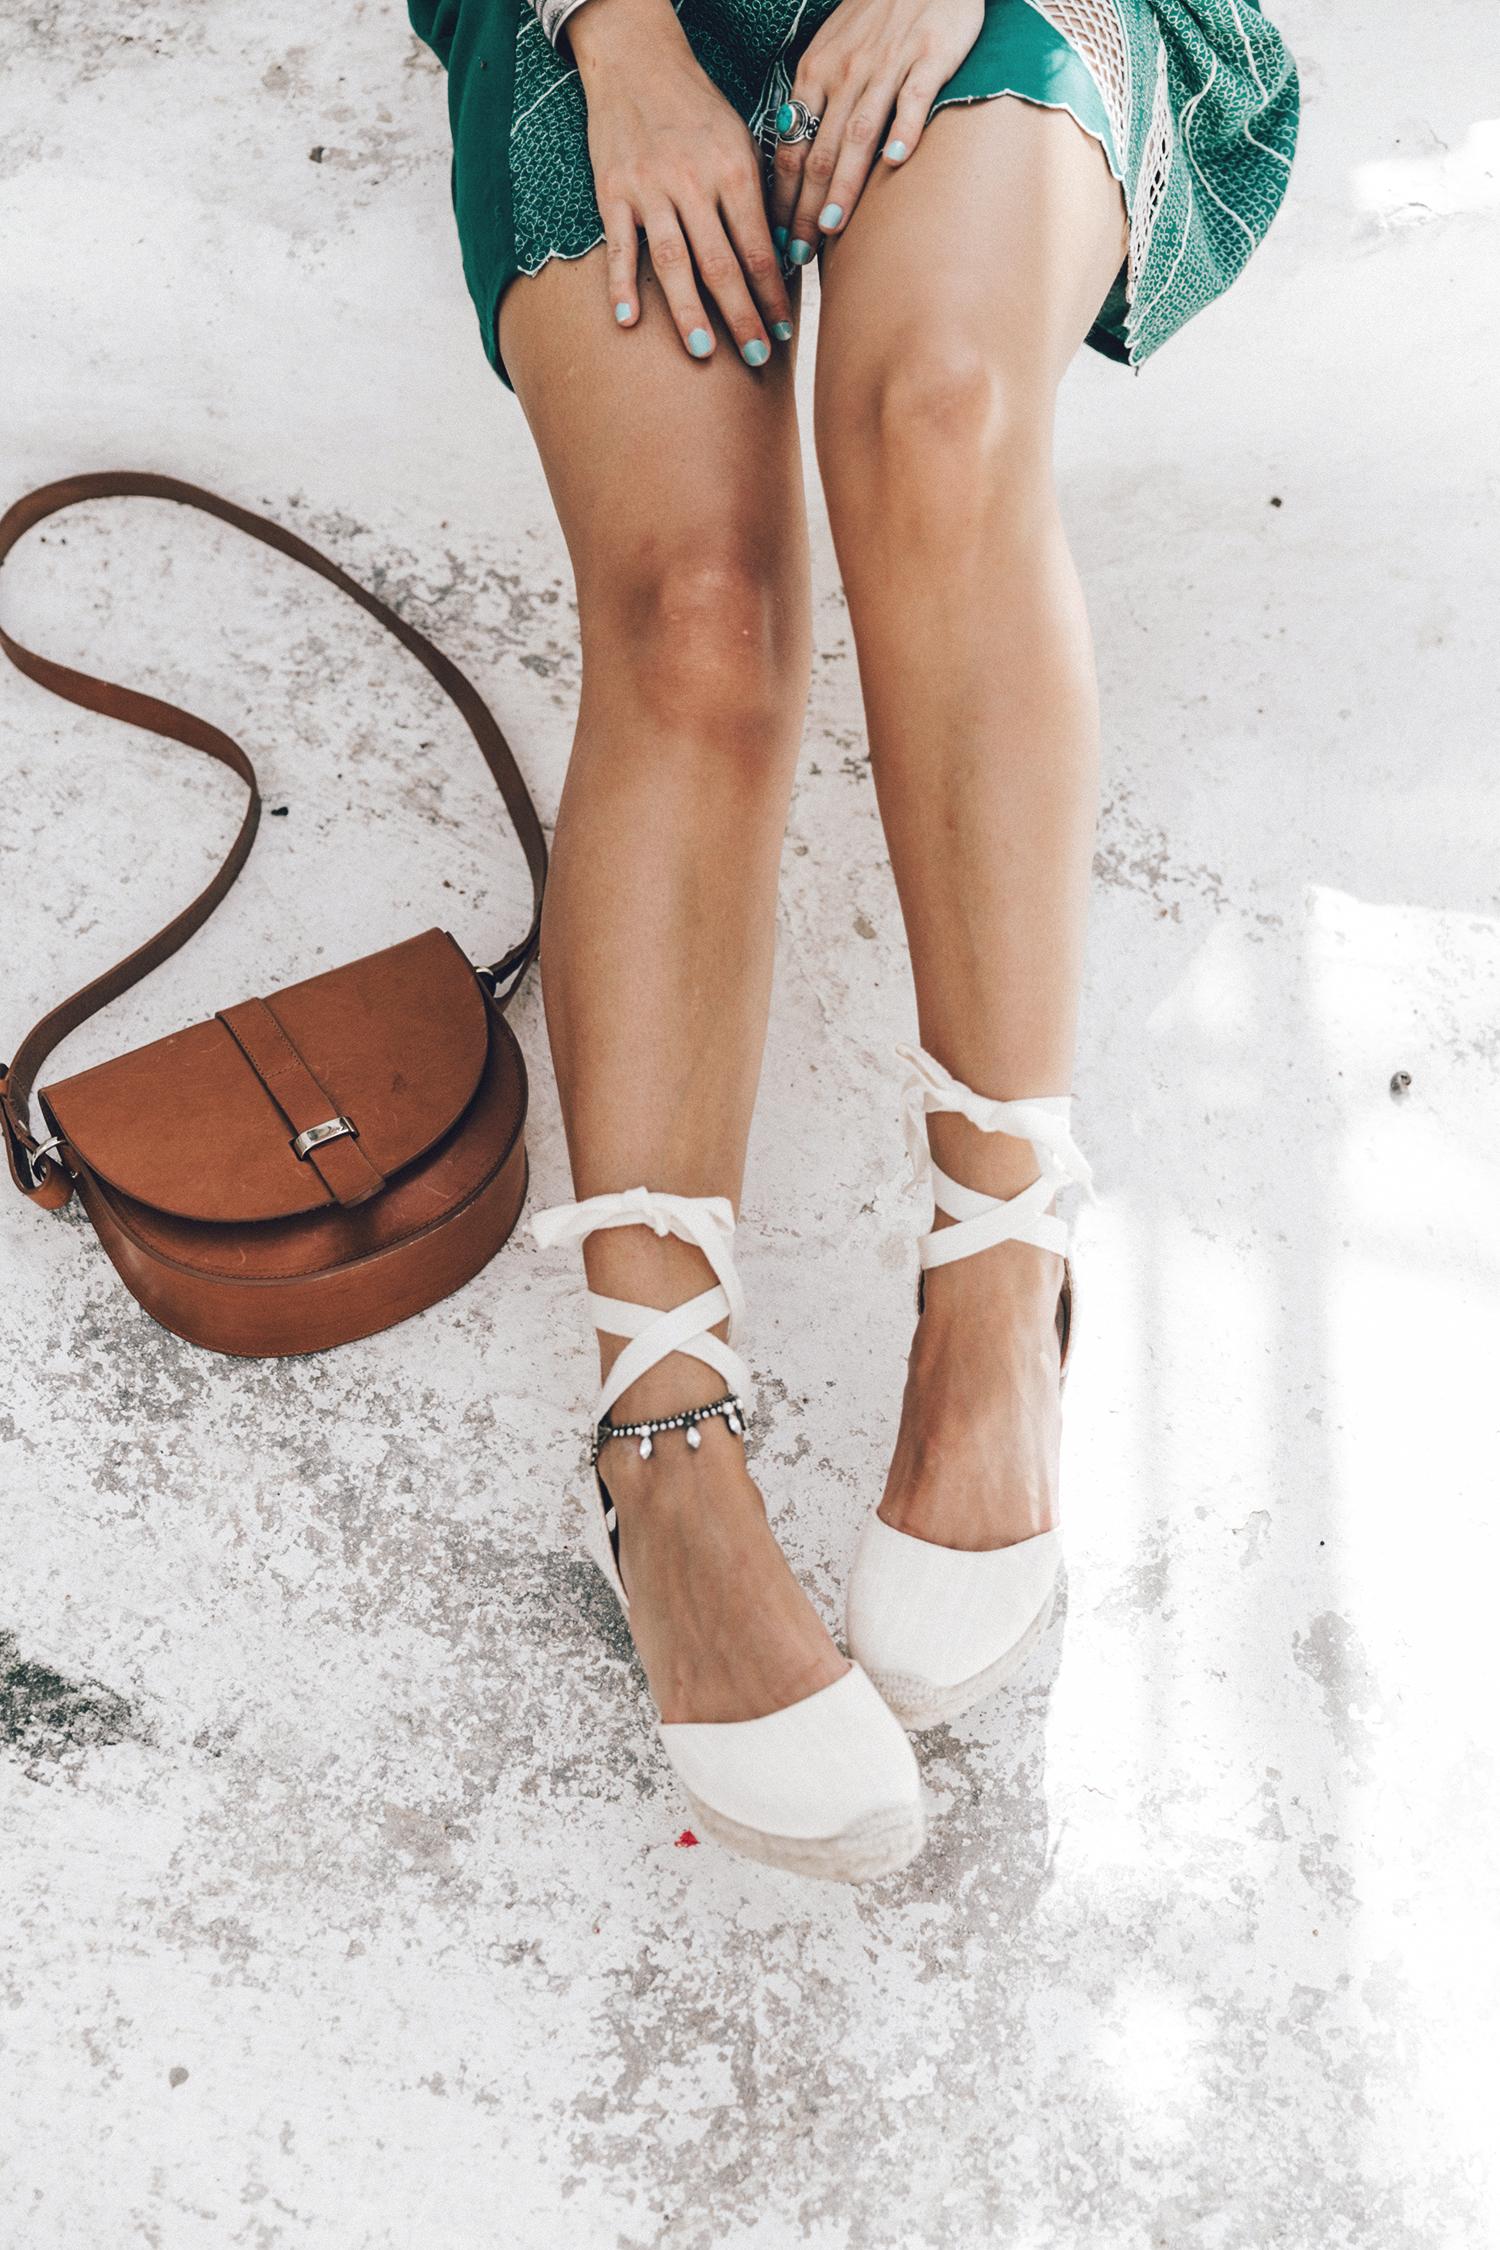 Tularosa_Dress-Soludos_Escapes-Soludos_Espadrilles-Sezane_Bag-Leather_Crossbody_Bag-Boho_Outfit-Look-Ray_Ban-Street_Style-Mykonos-Greece-Collage_Vintage-52-Recuperado